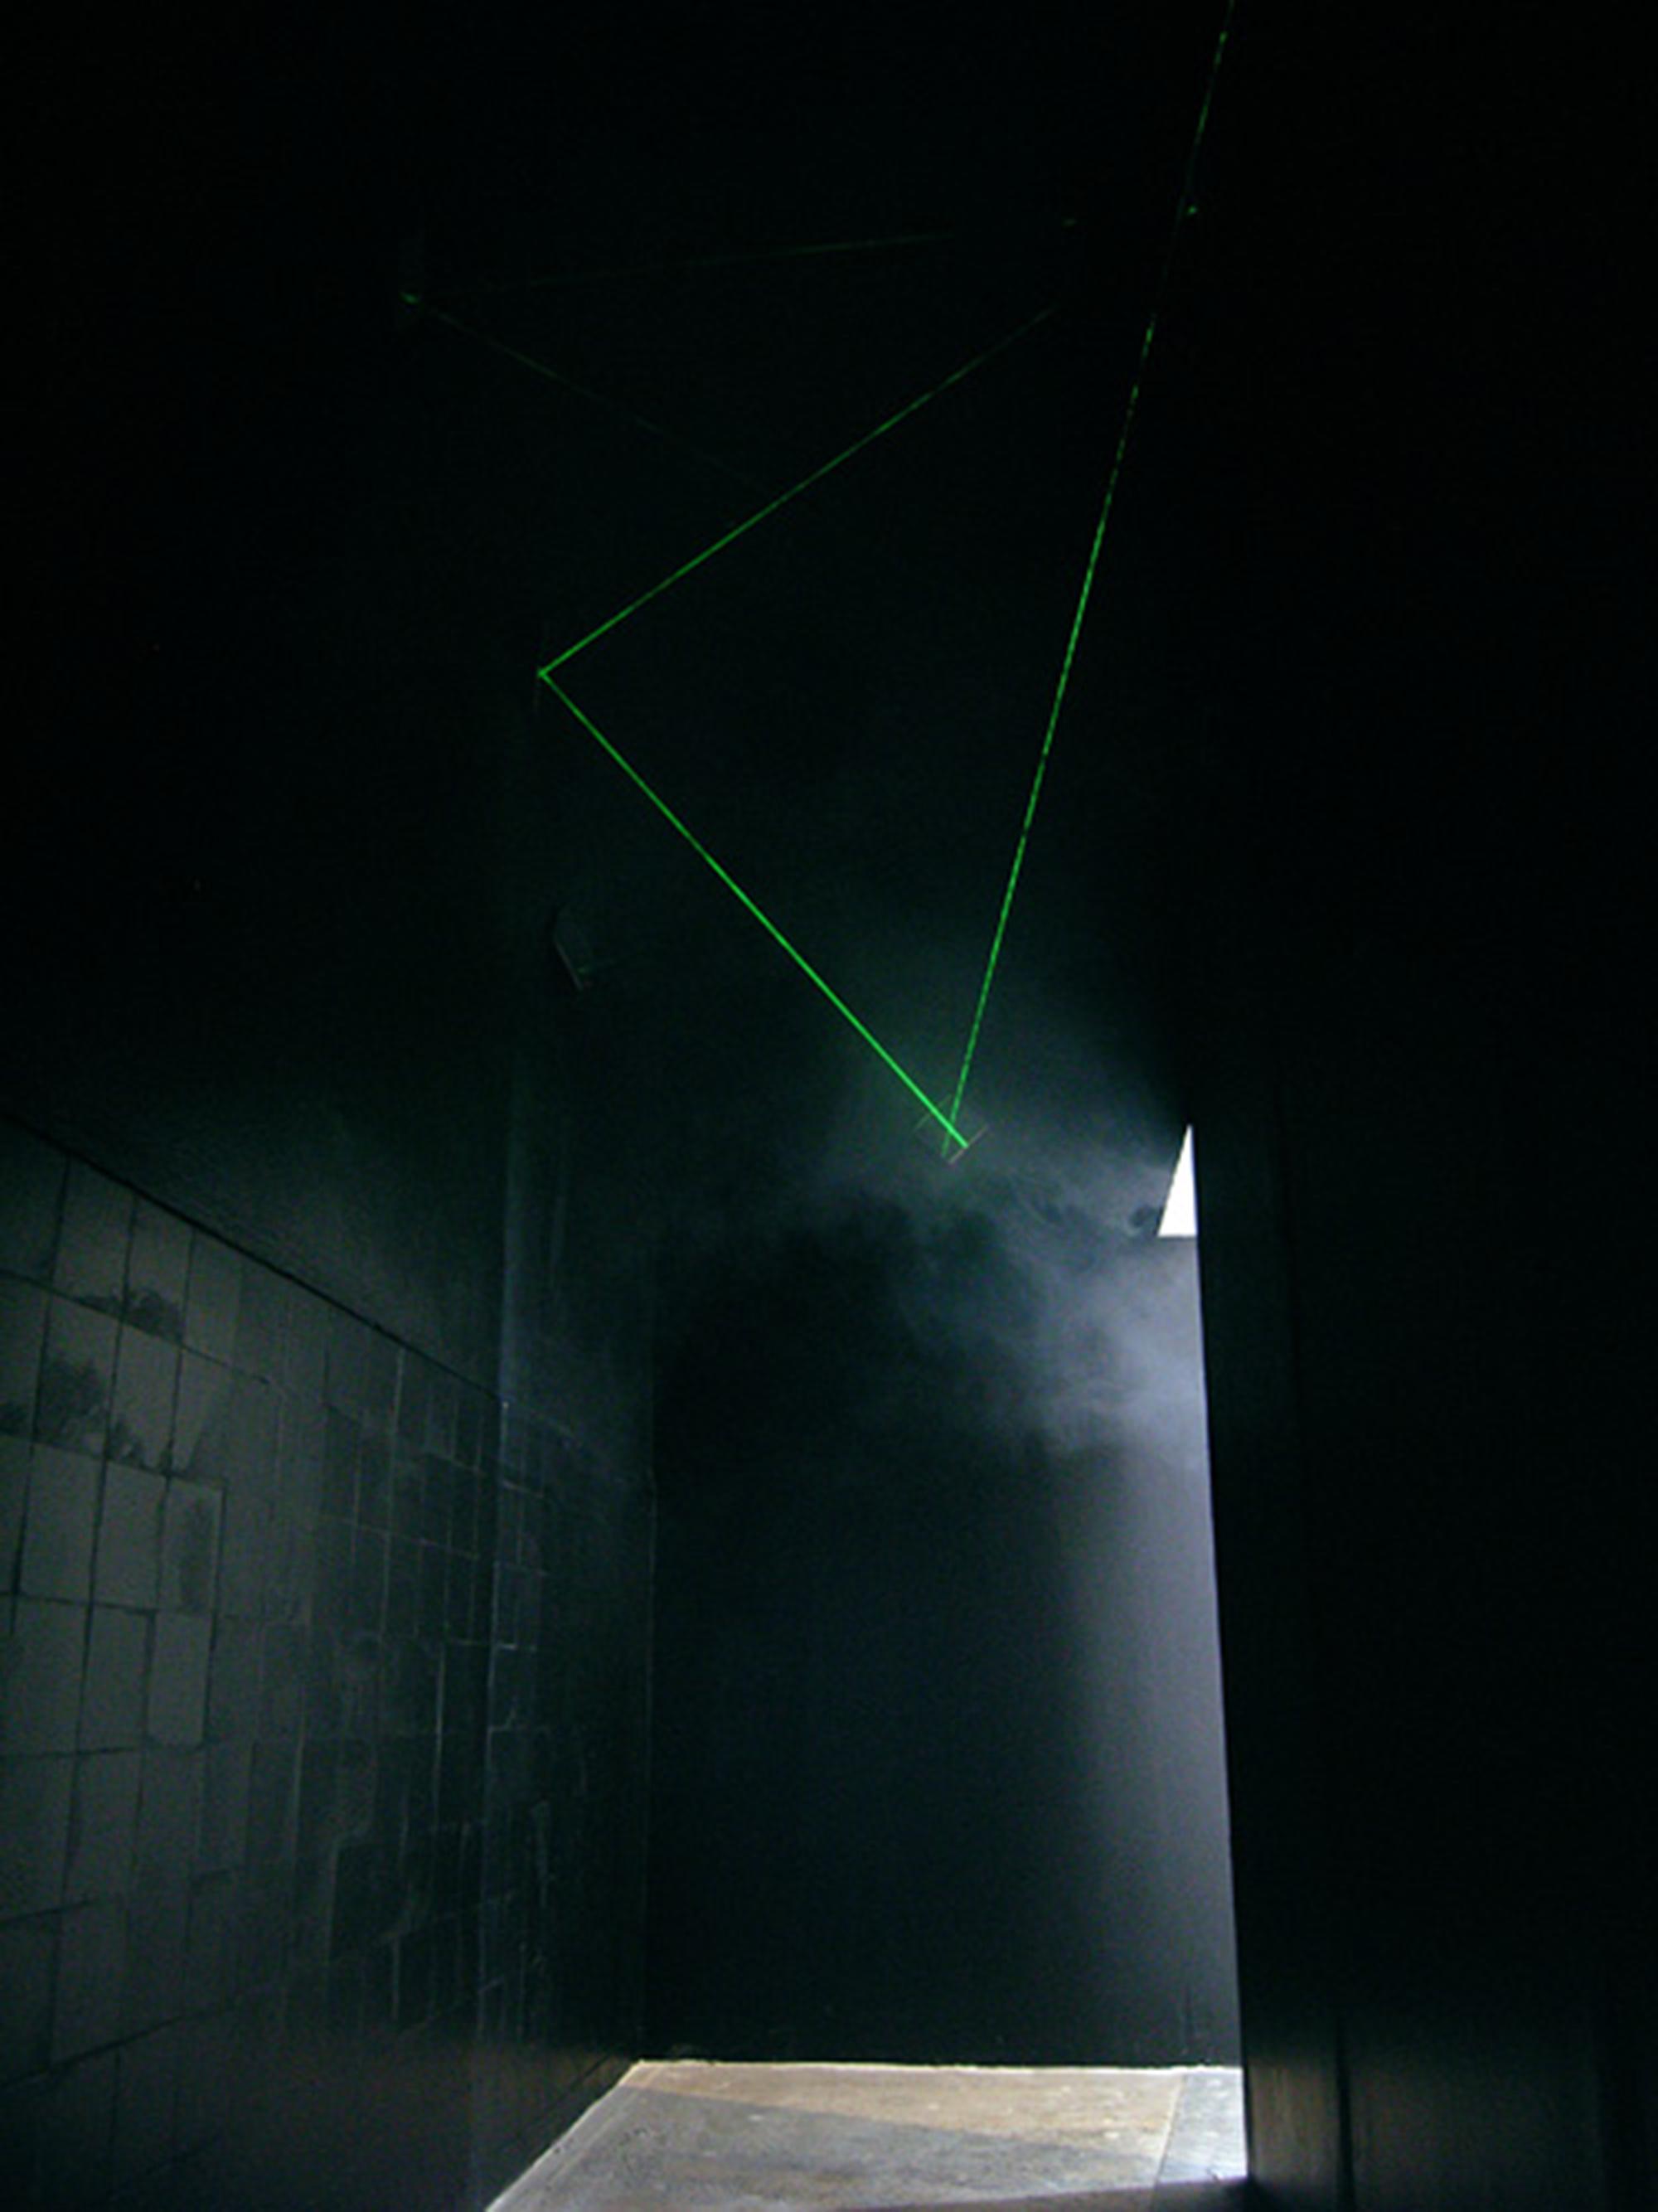 LARS_MORELL_blurry_diamonds